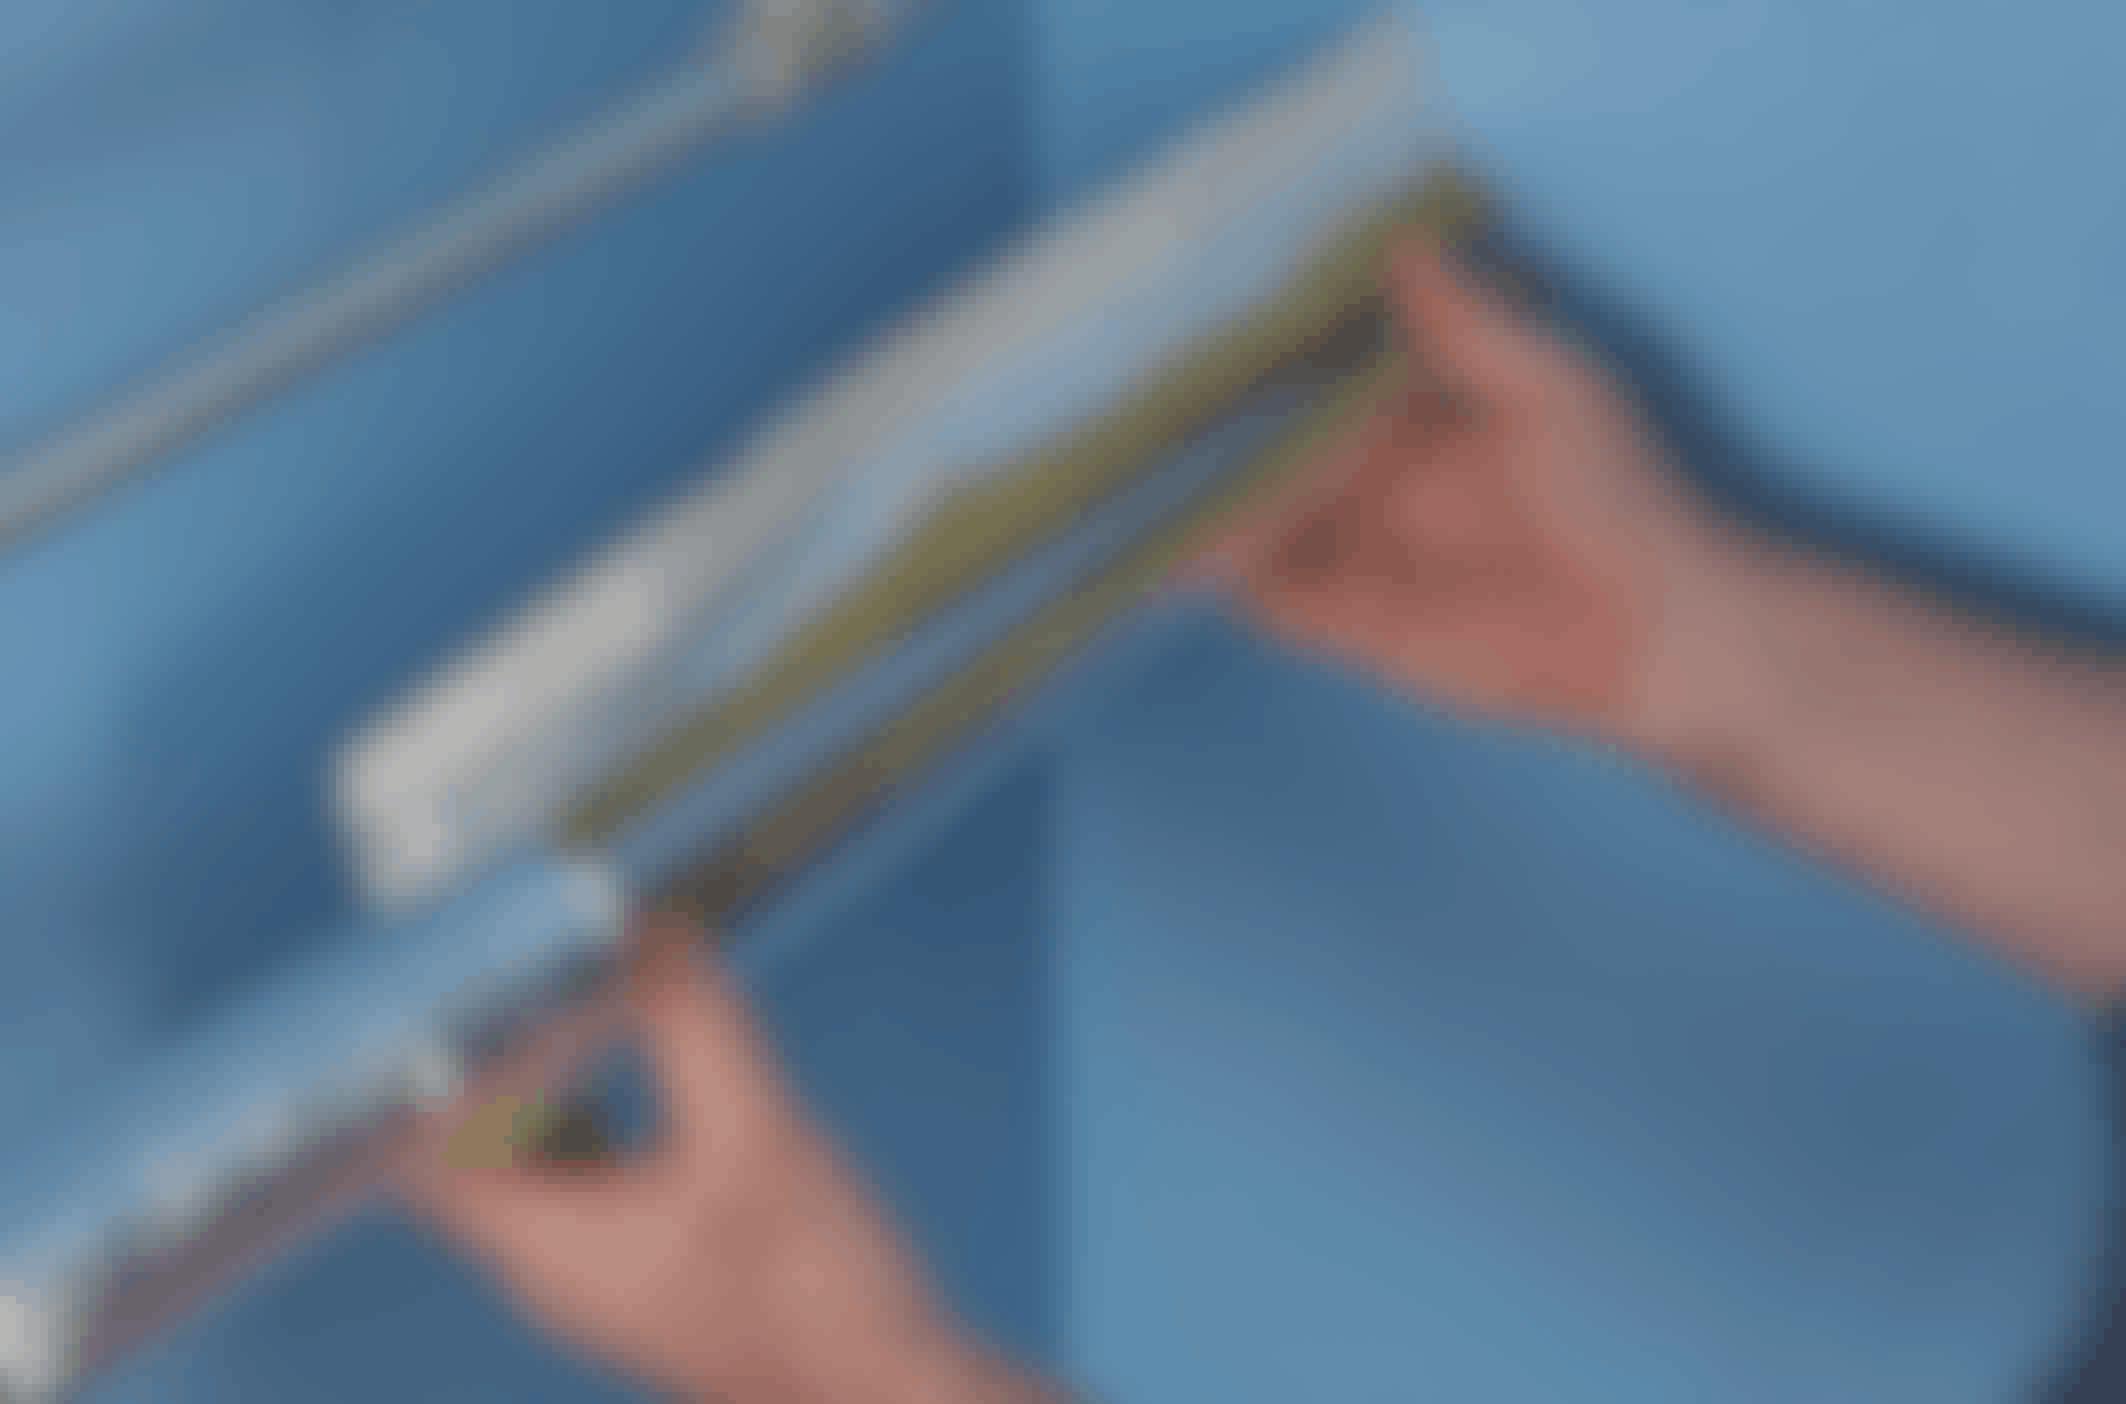 Rørisolering: Den enkleste besparelsen